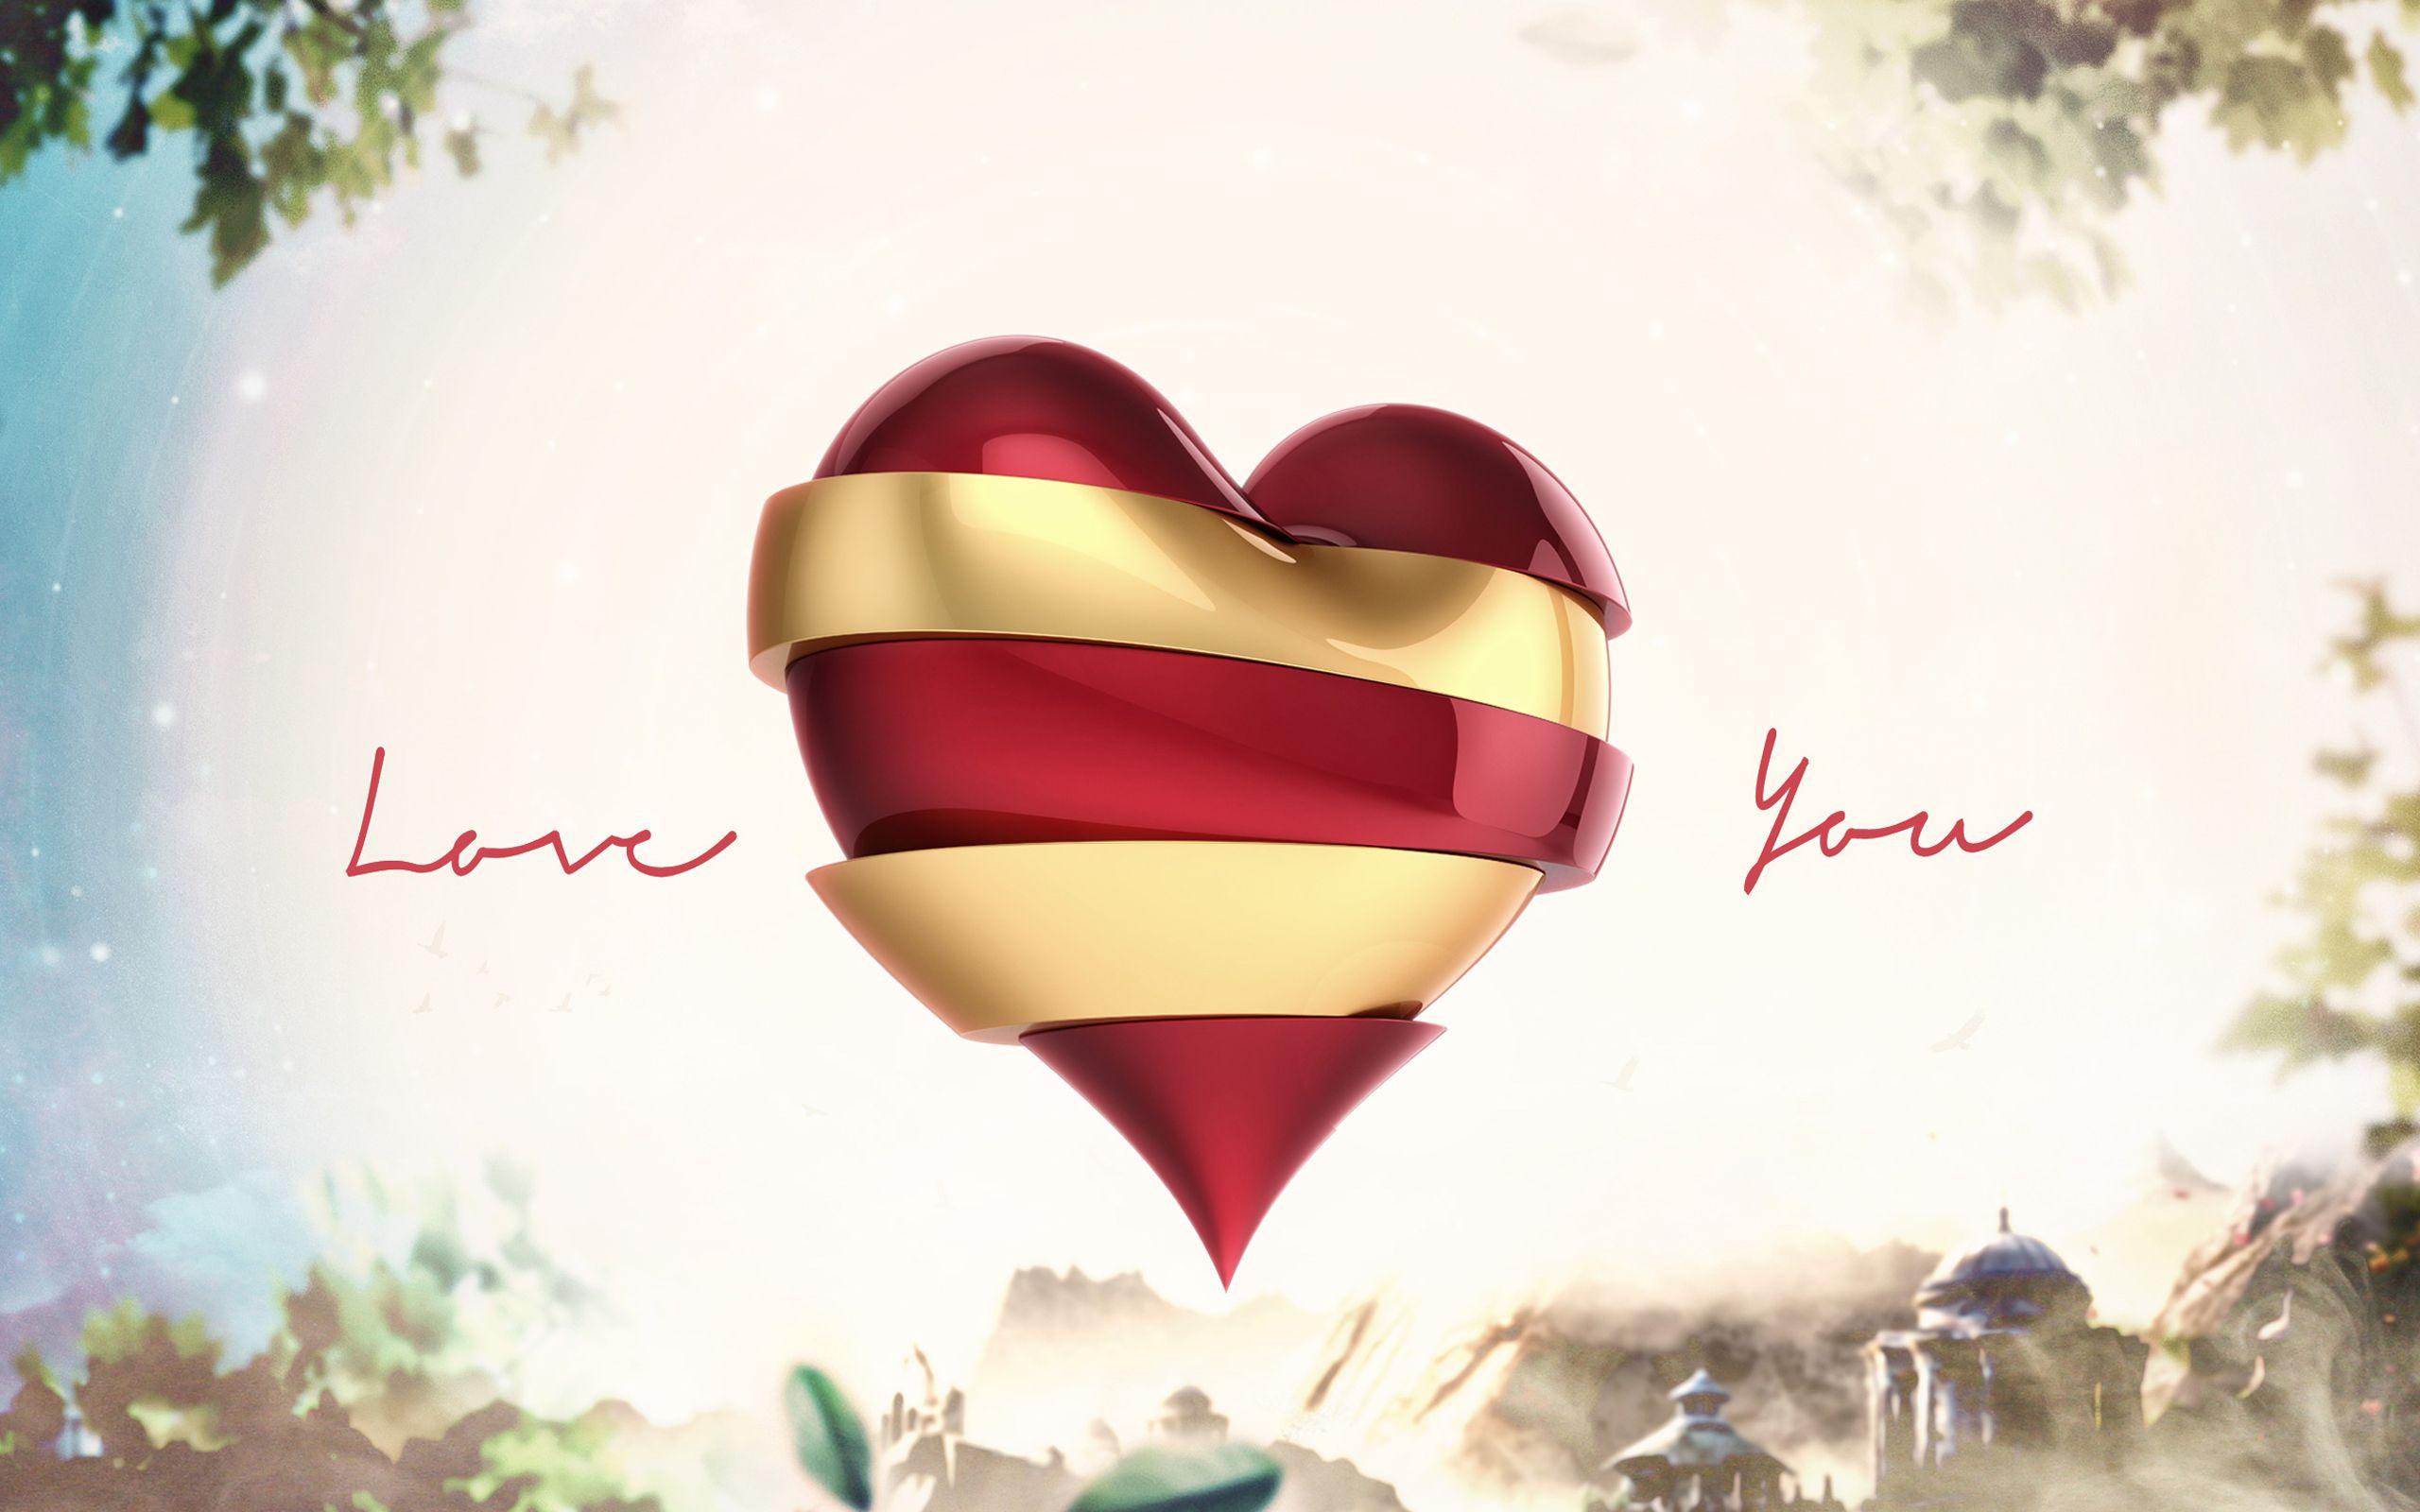 Beautiful Love Hd Wallpaper With Heart Love Romance Rose Hearts